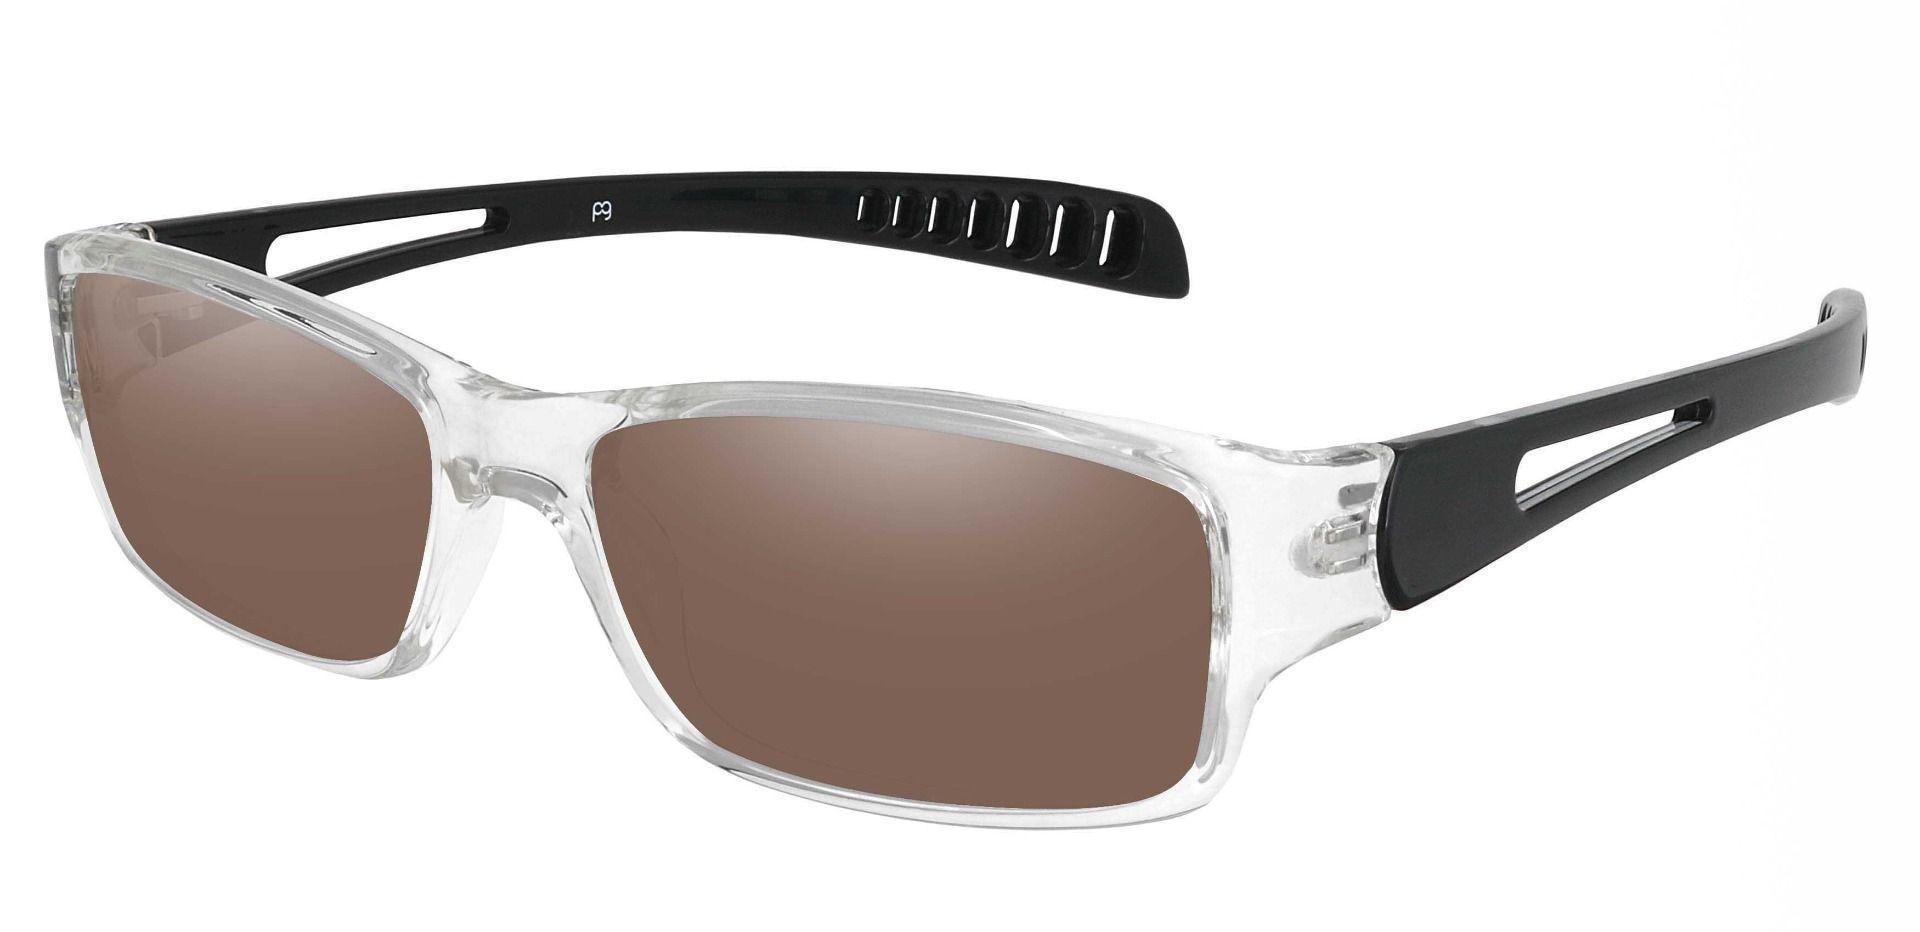 Mercury Rectangle Prescription Sunglasses - Clear Frame With Brown Lenses